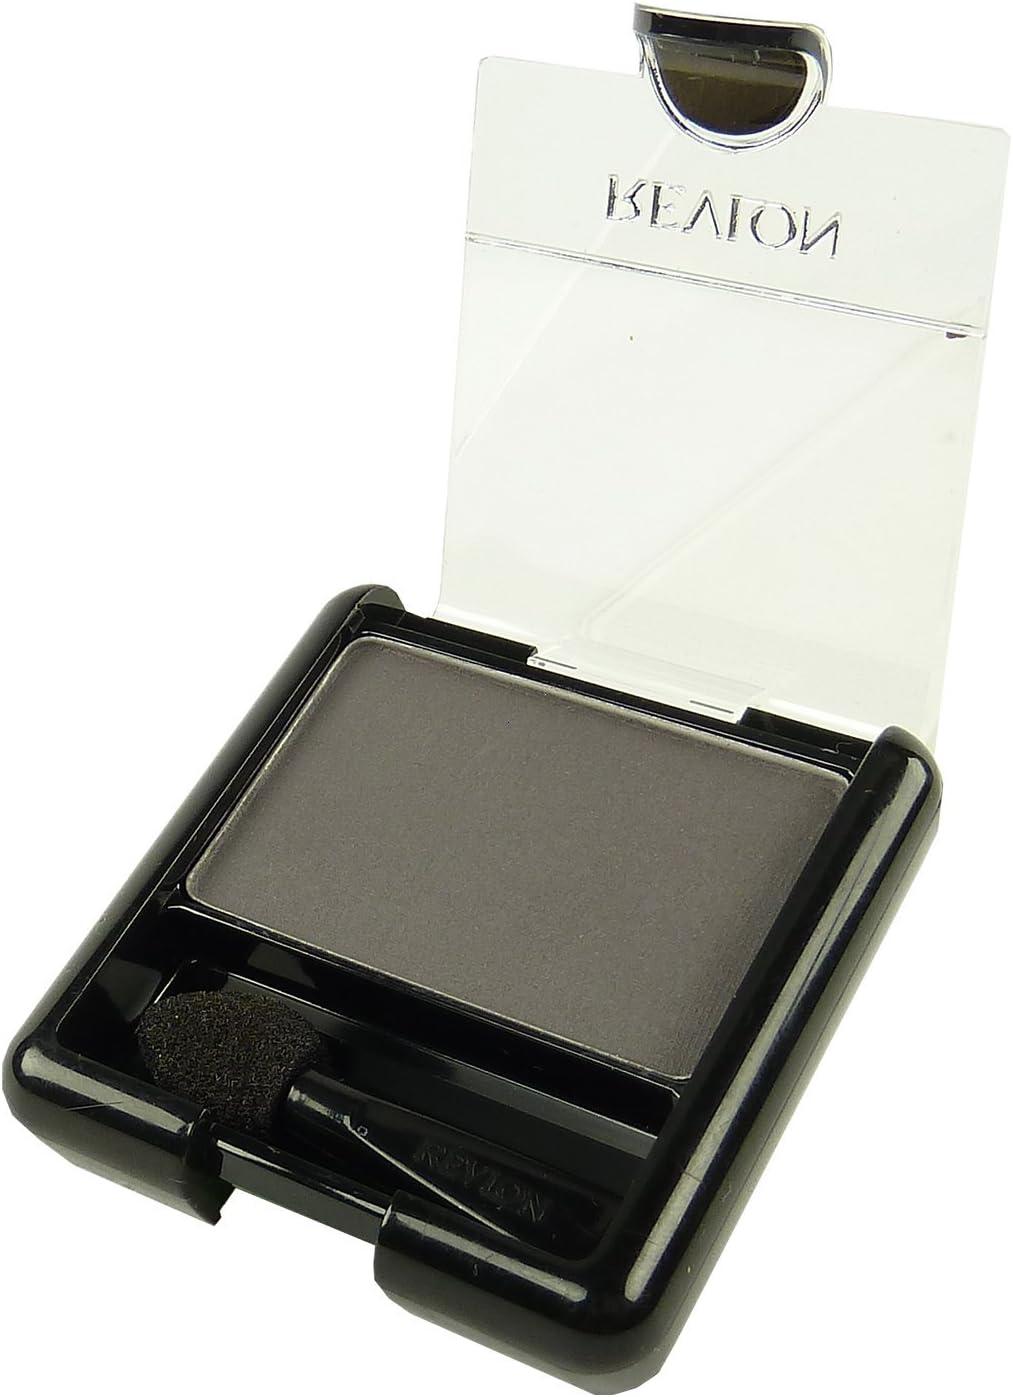 Revlon – Wet/Dry Eyeshadow Color 16 Stormy – Sombras – Ojos Make Up – 3 G: Amazon.es: Belleza